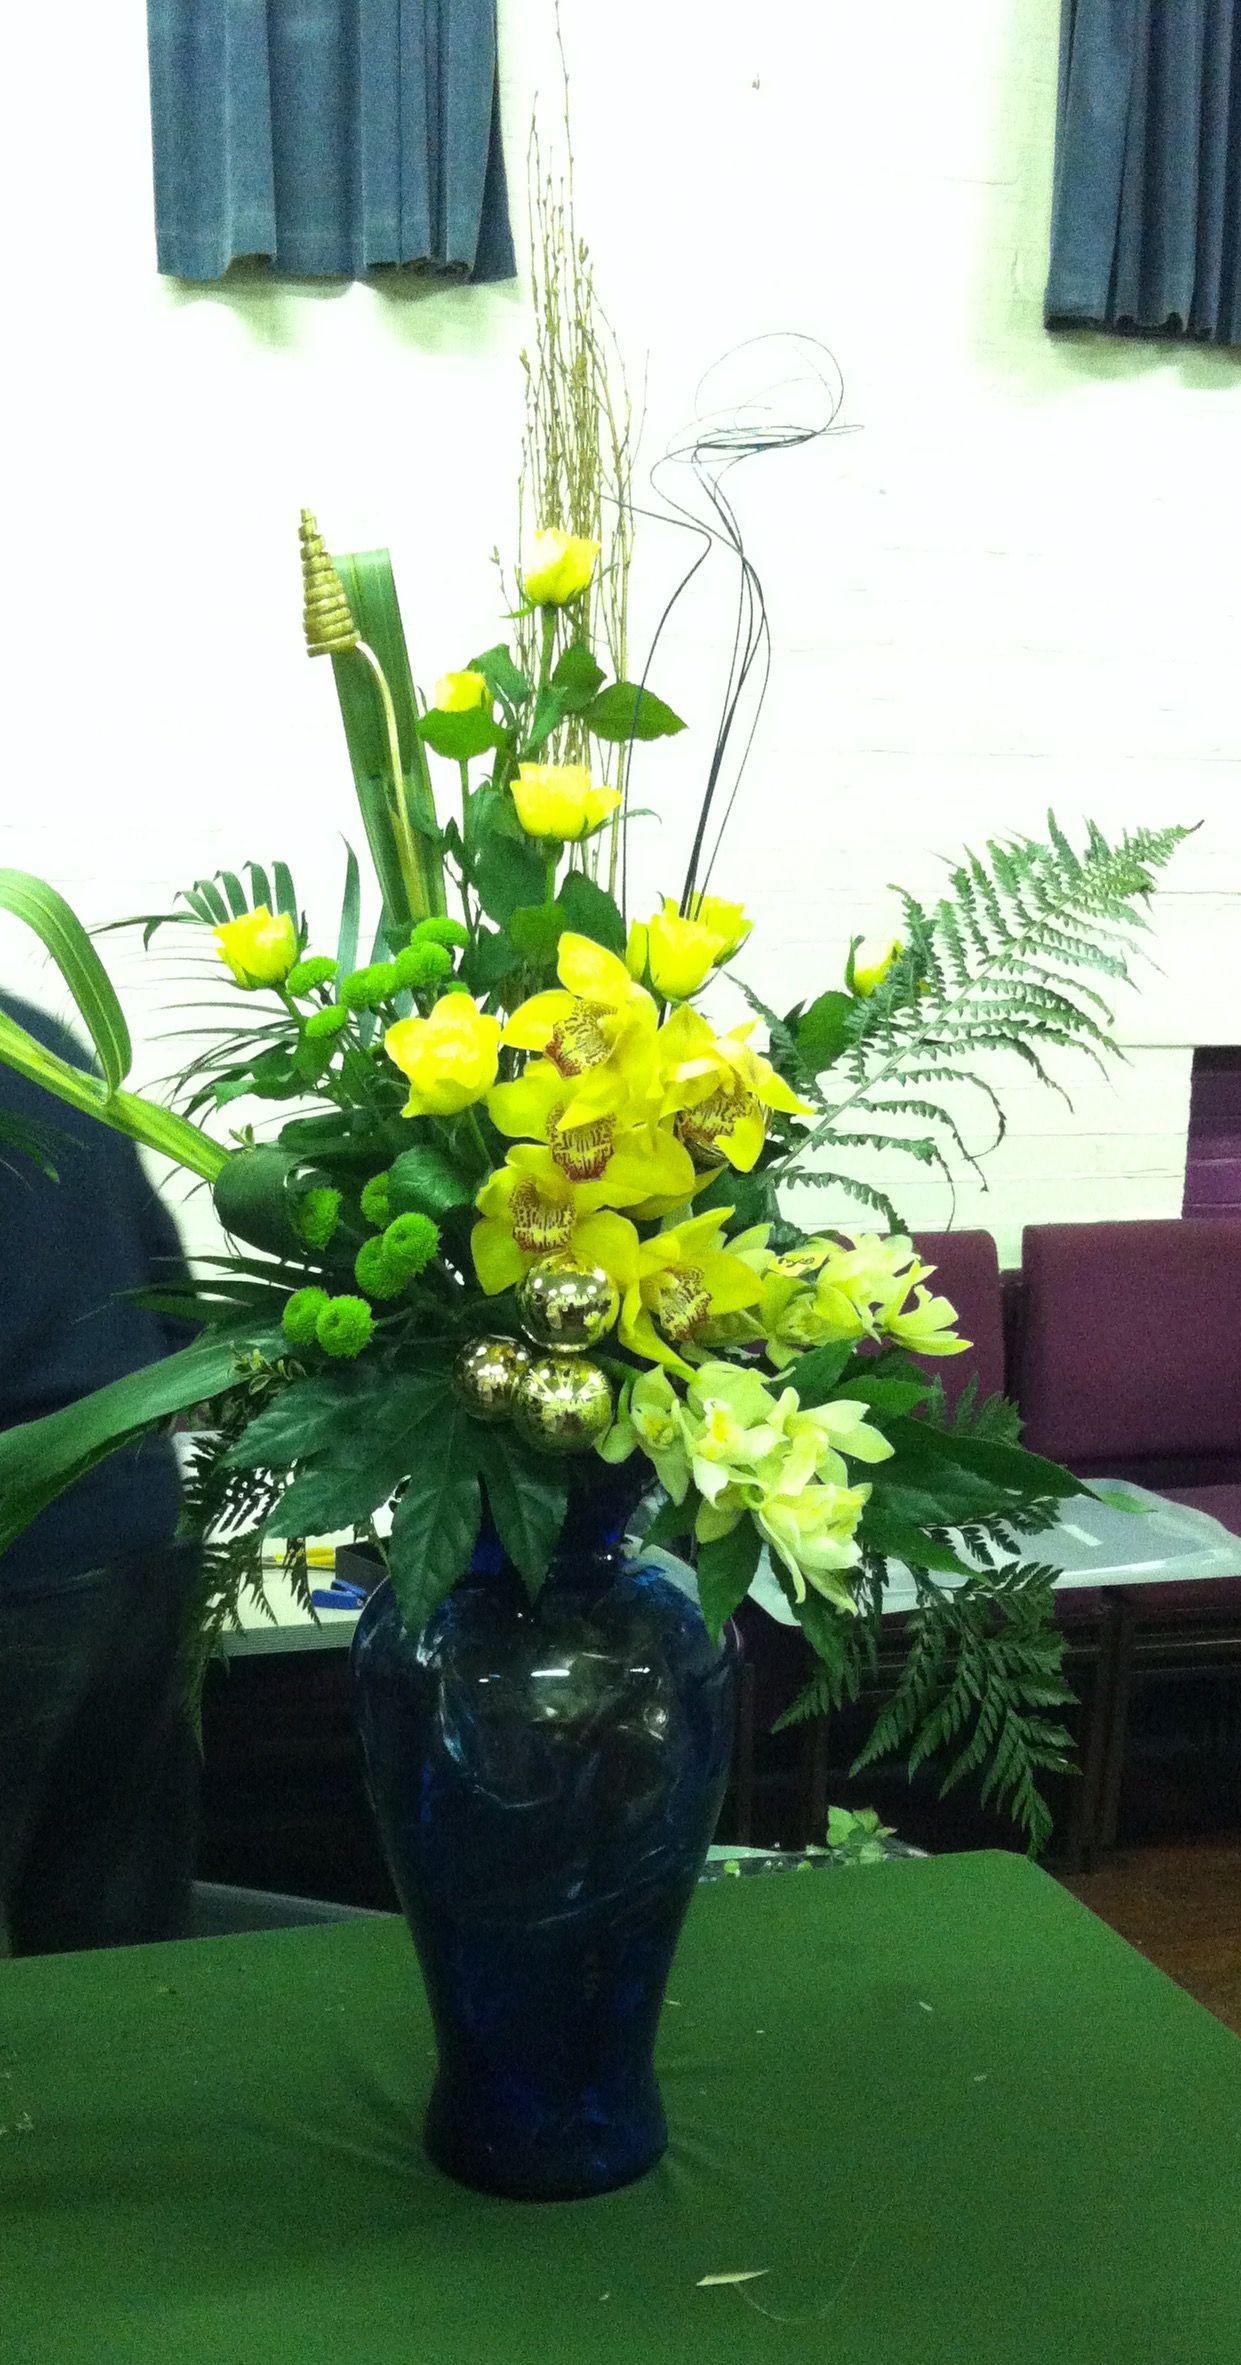 Flower Arrangement Orchid, Rose, Chrysanthemum, Phormium, Fatsia, Aspidistra, Fern